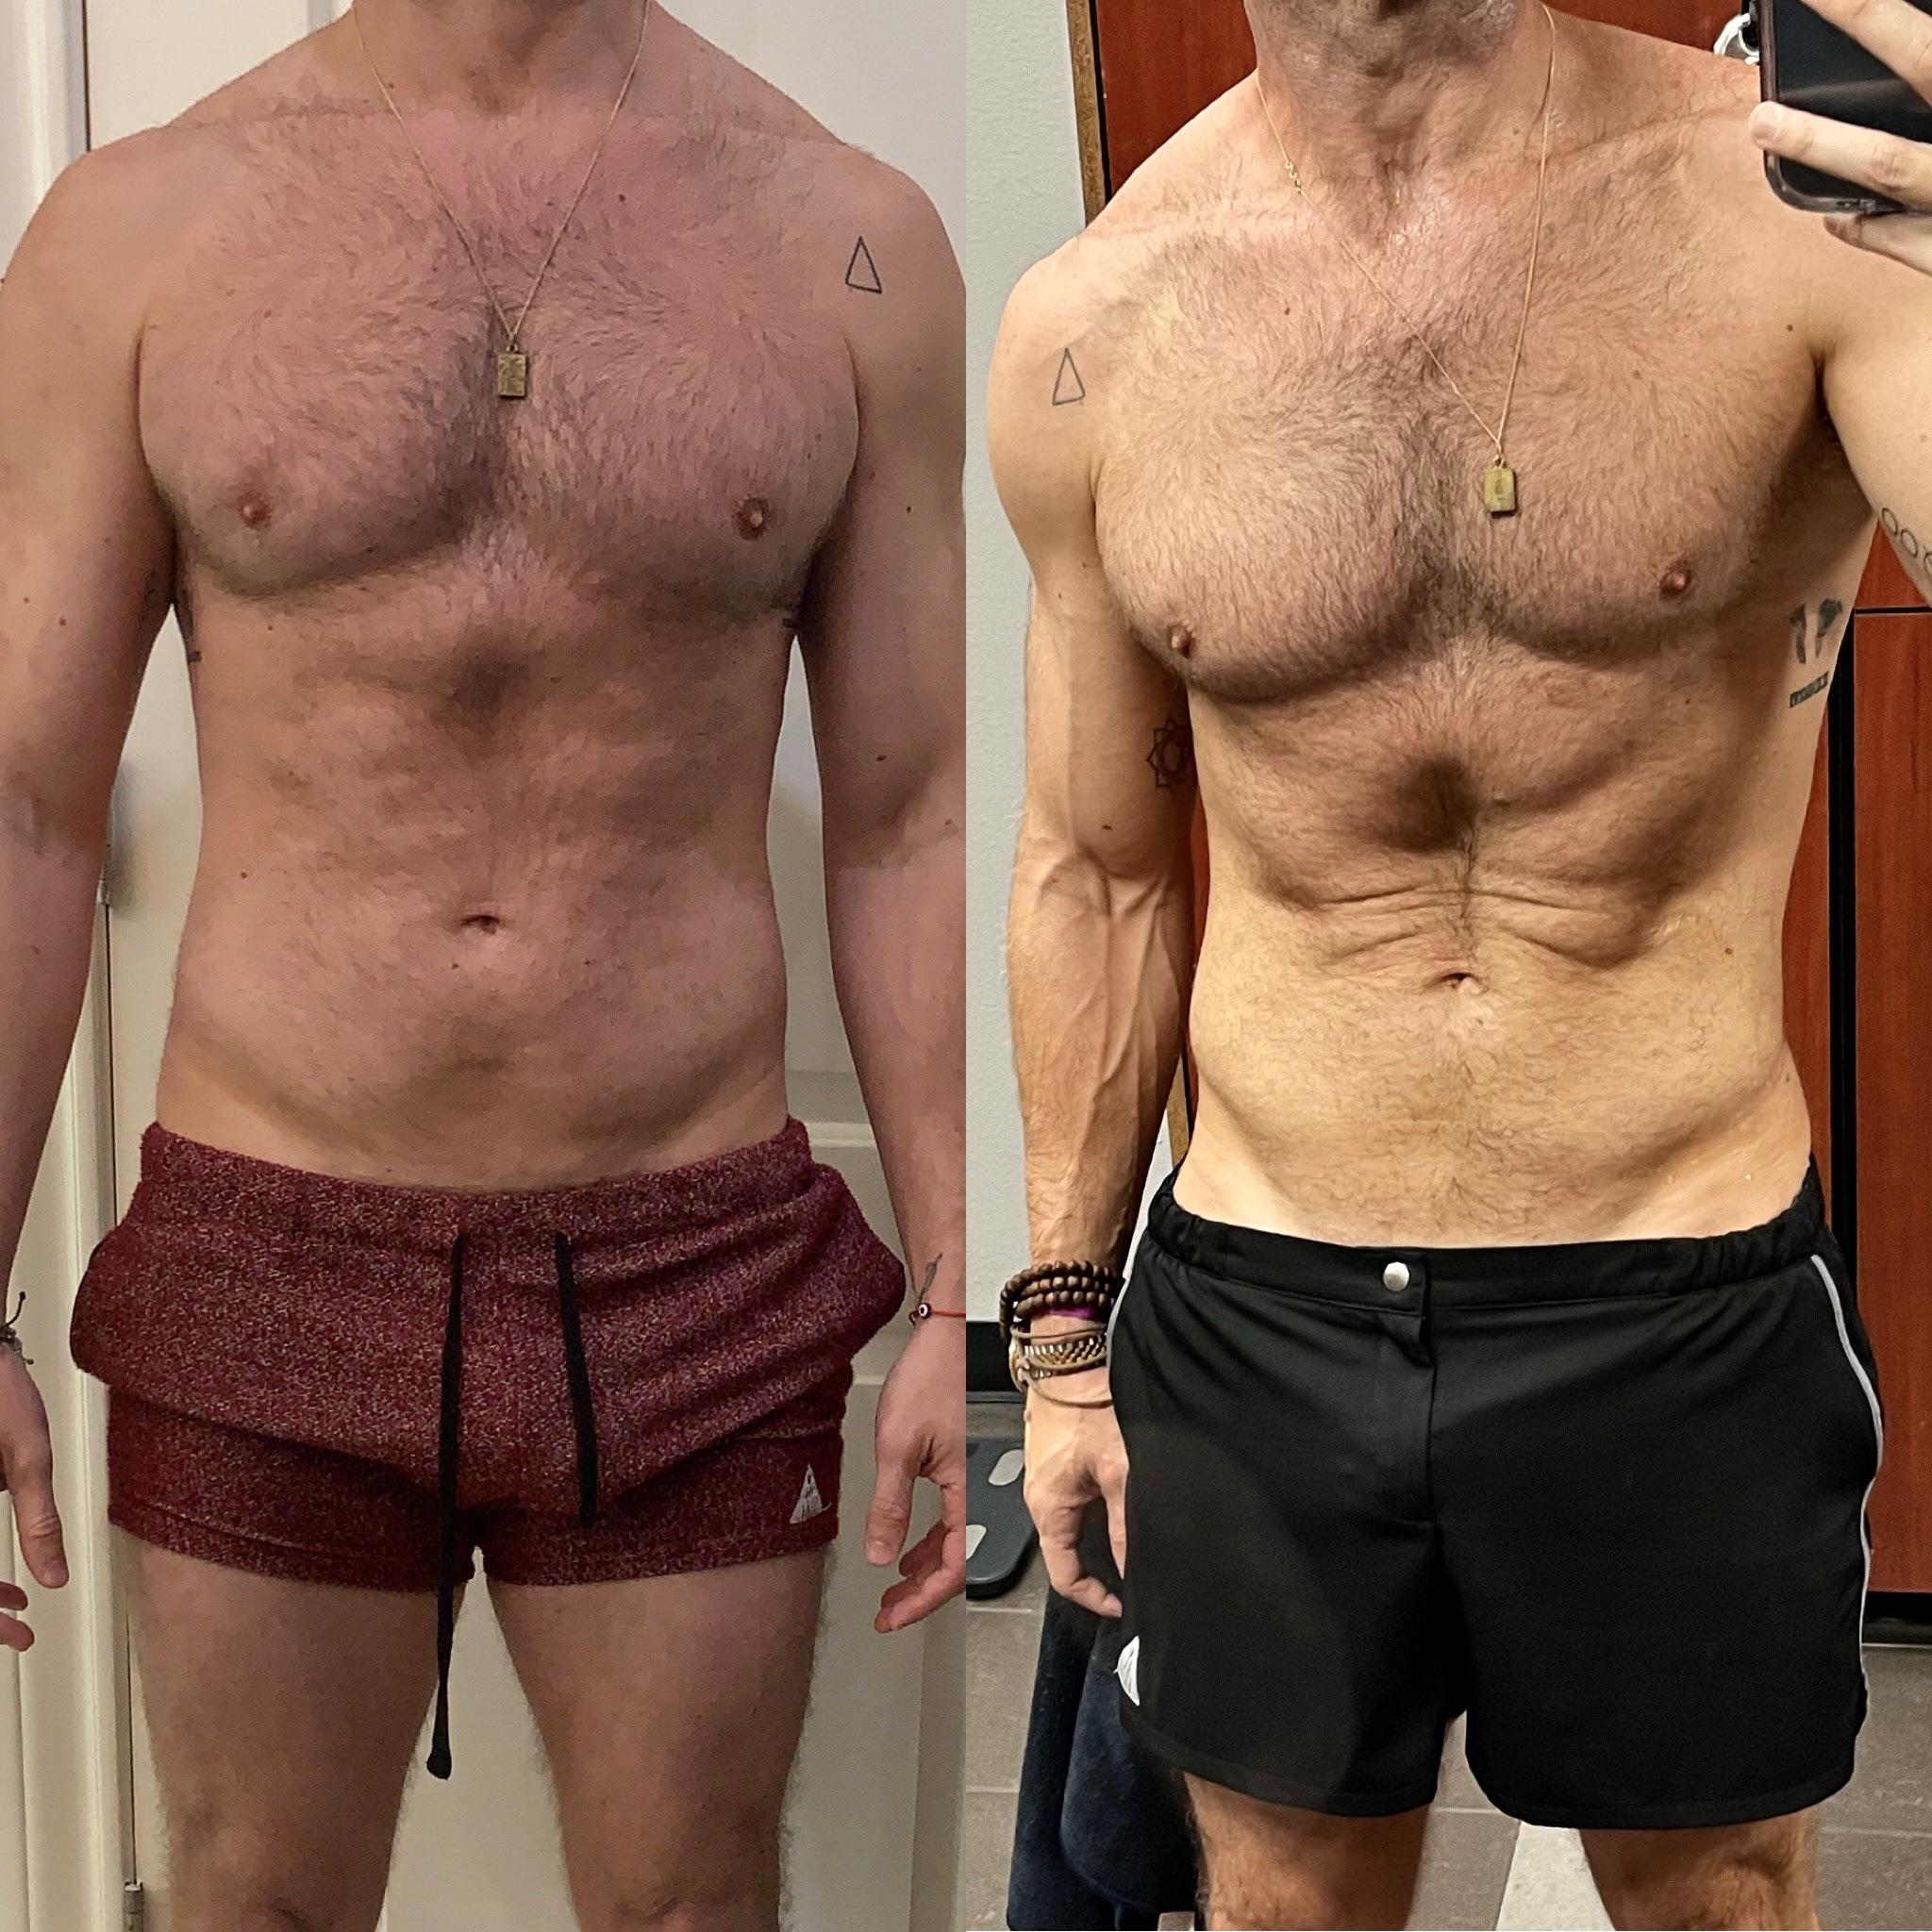 5 foot 10 Male 16 lbs Weight Loss 186 lbs to 170 lbs